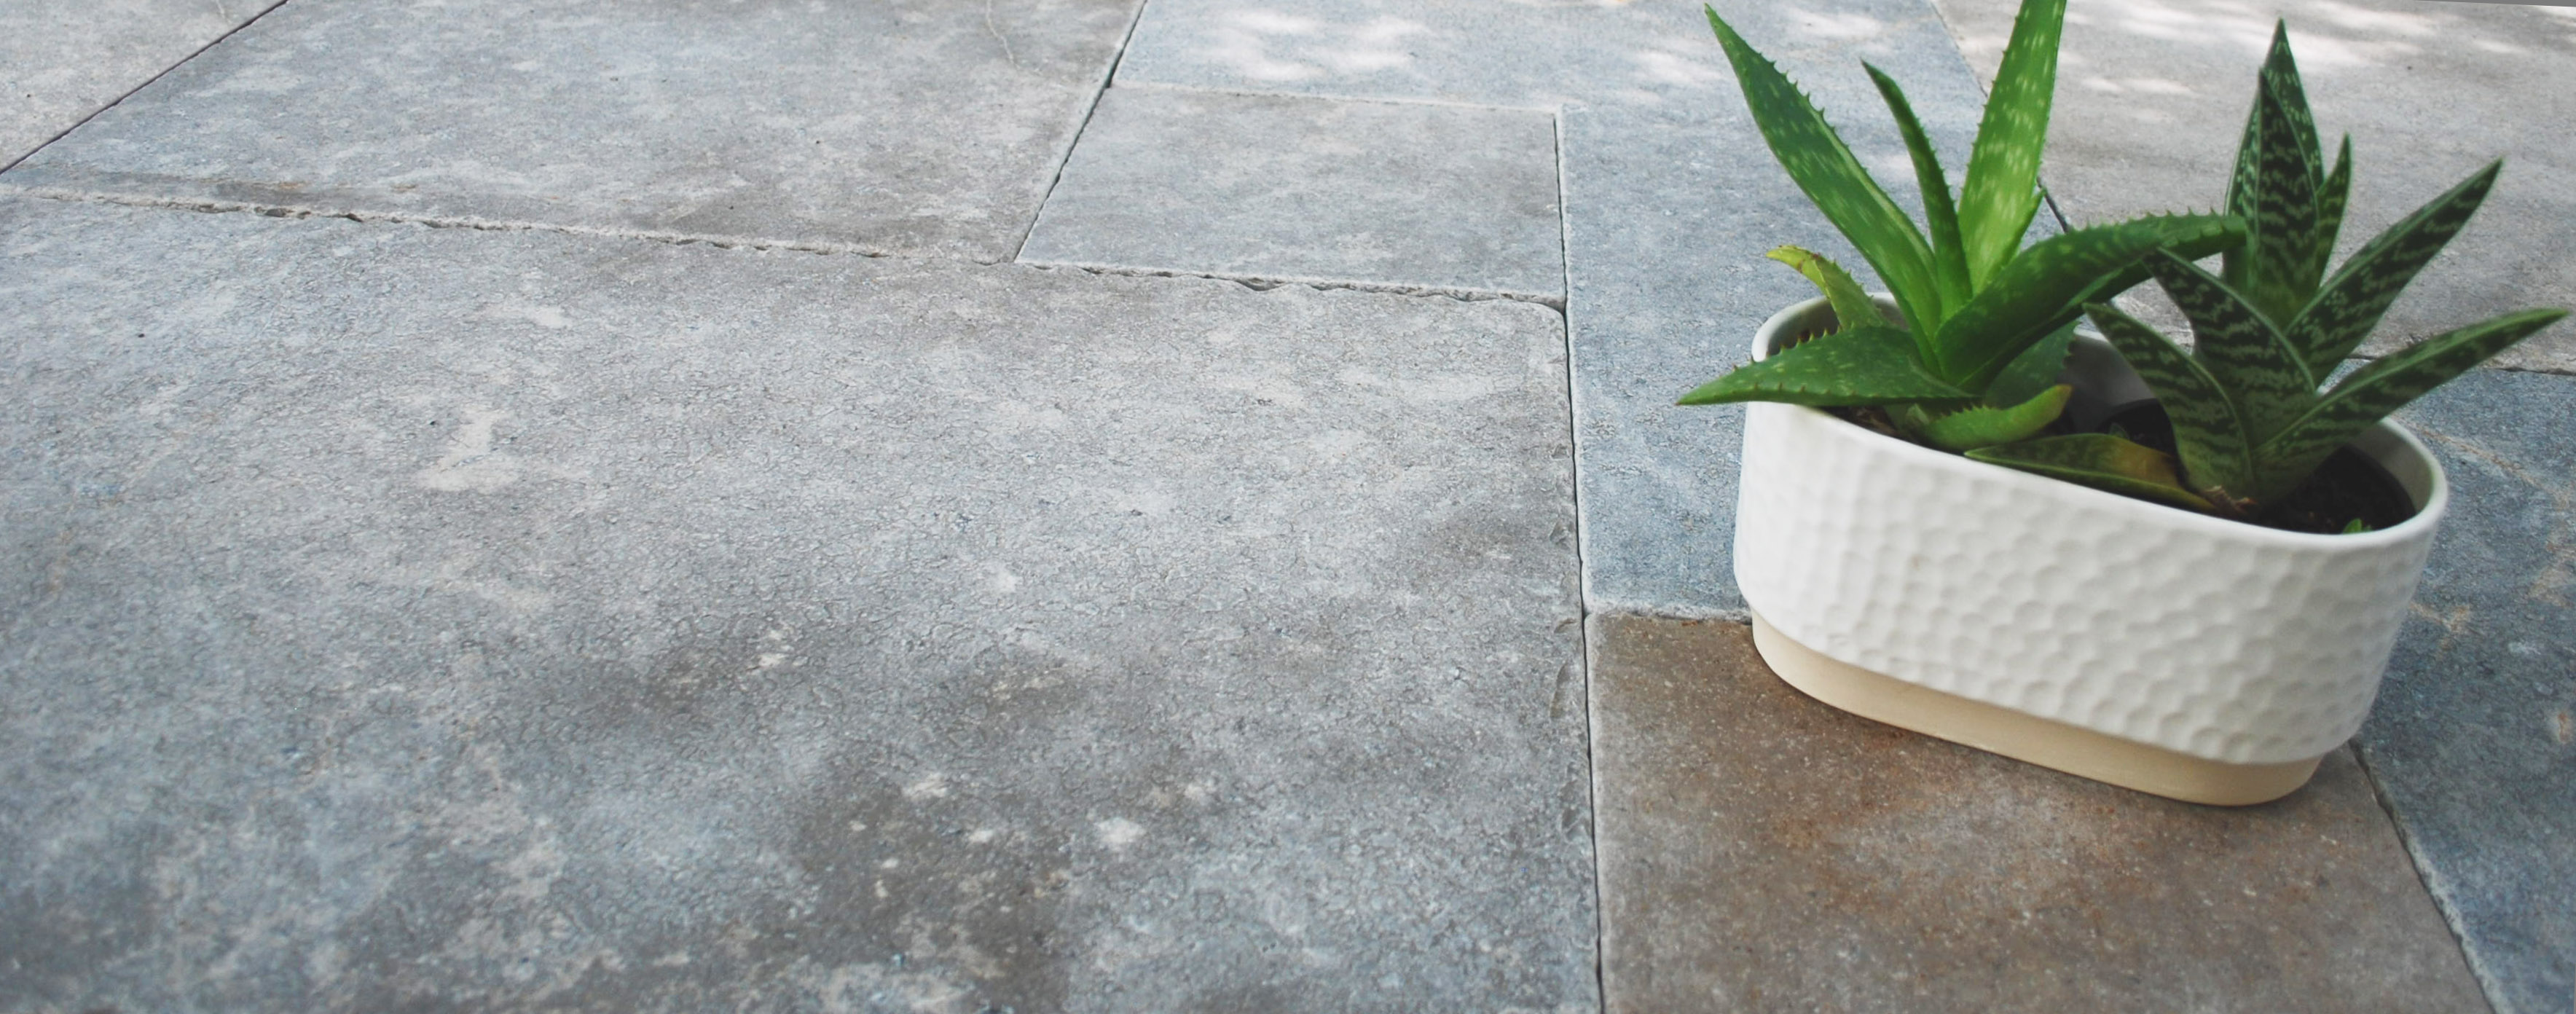 Natural grey stones